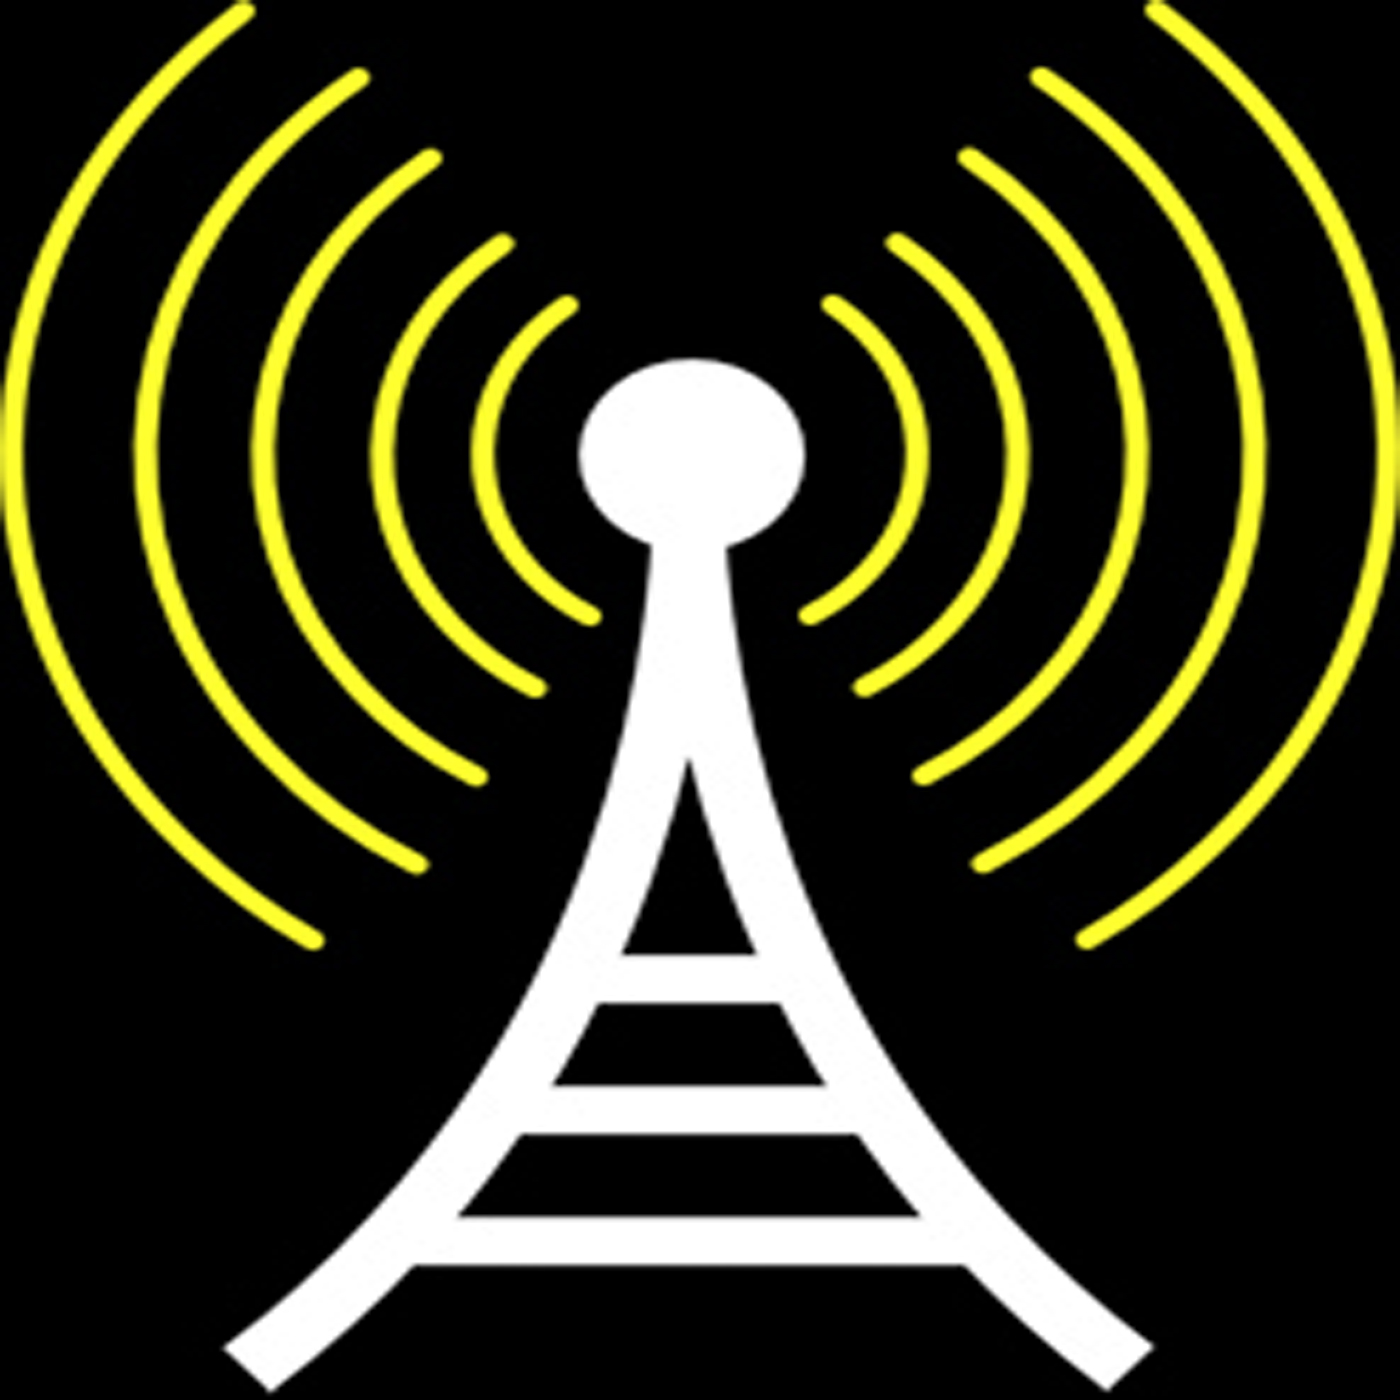 Radio Free Albion show art